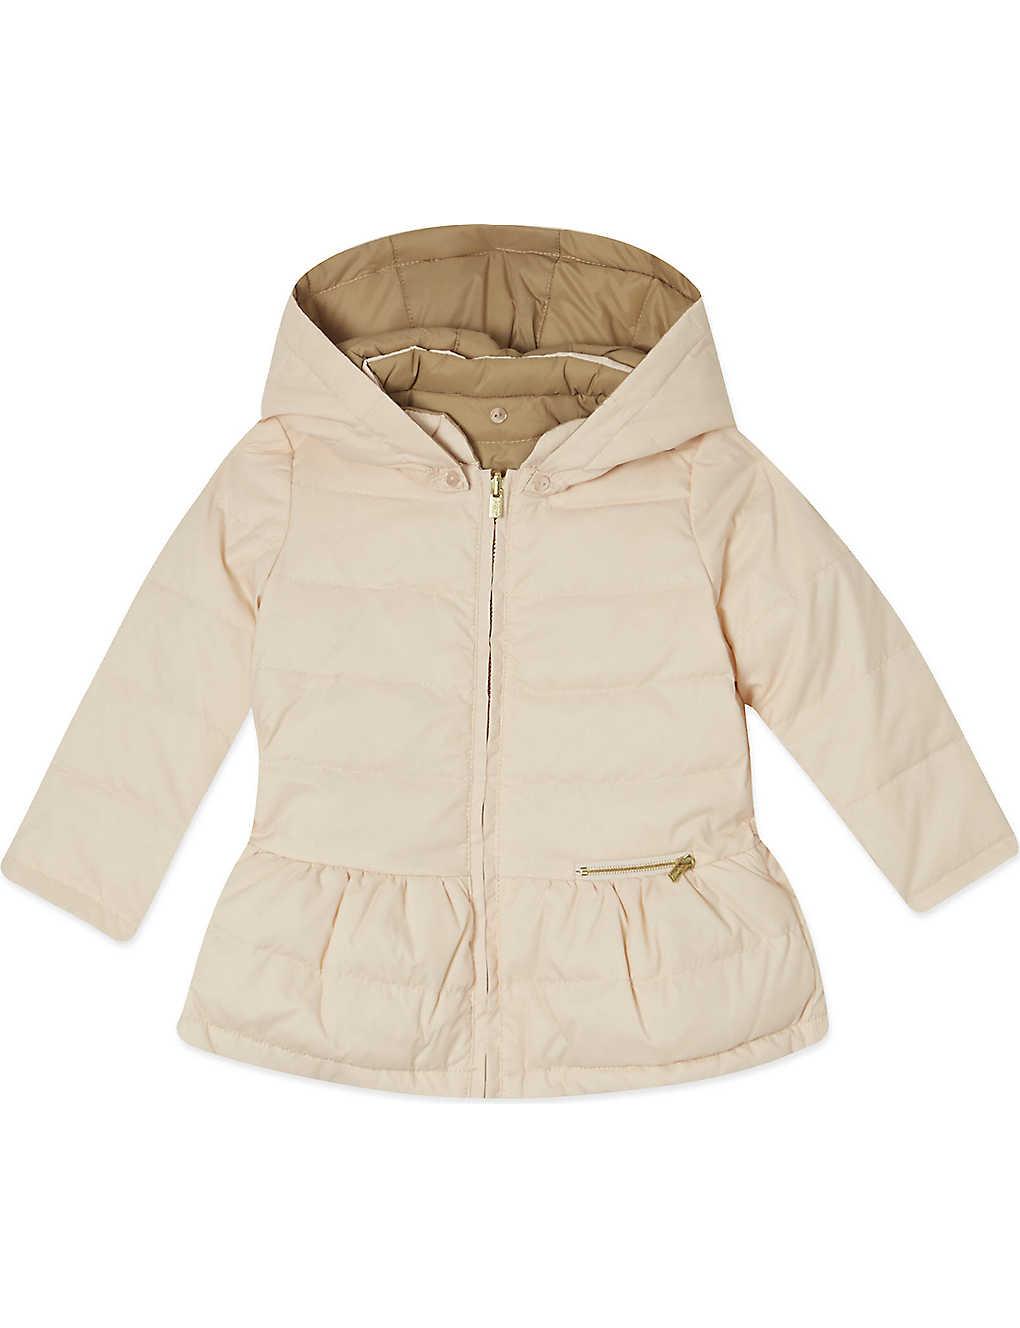 1f5b75ad19 CHLOE - Reversible puffer jacket 6-36 months | Selfridges.com